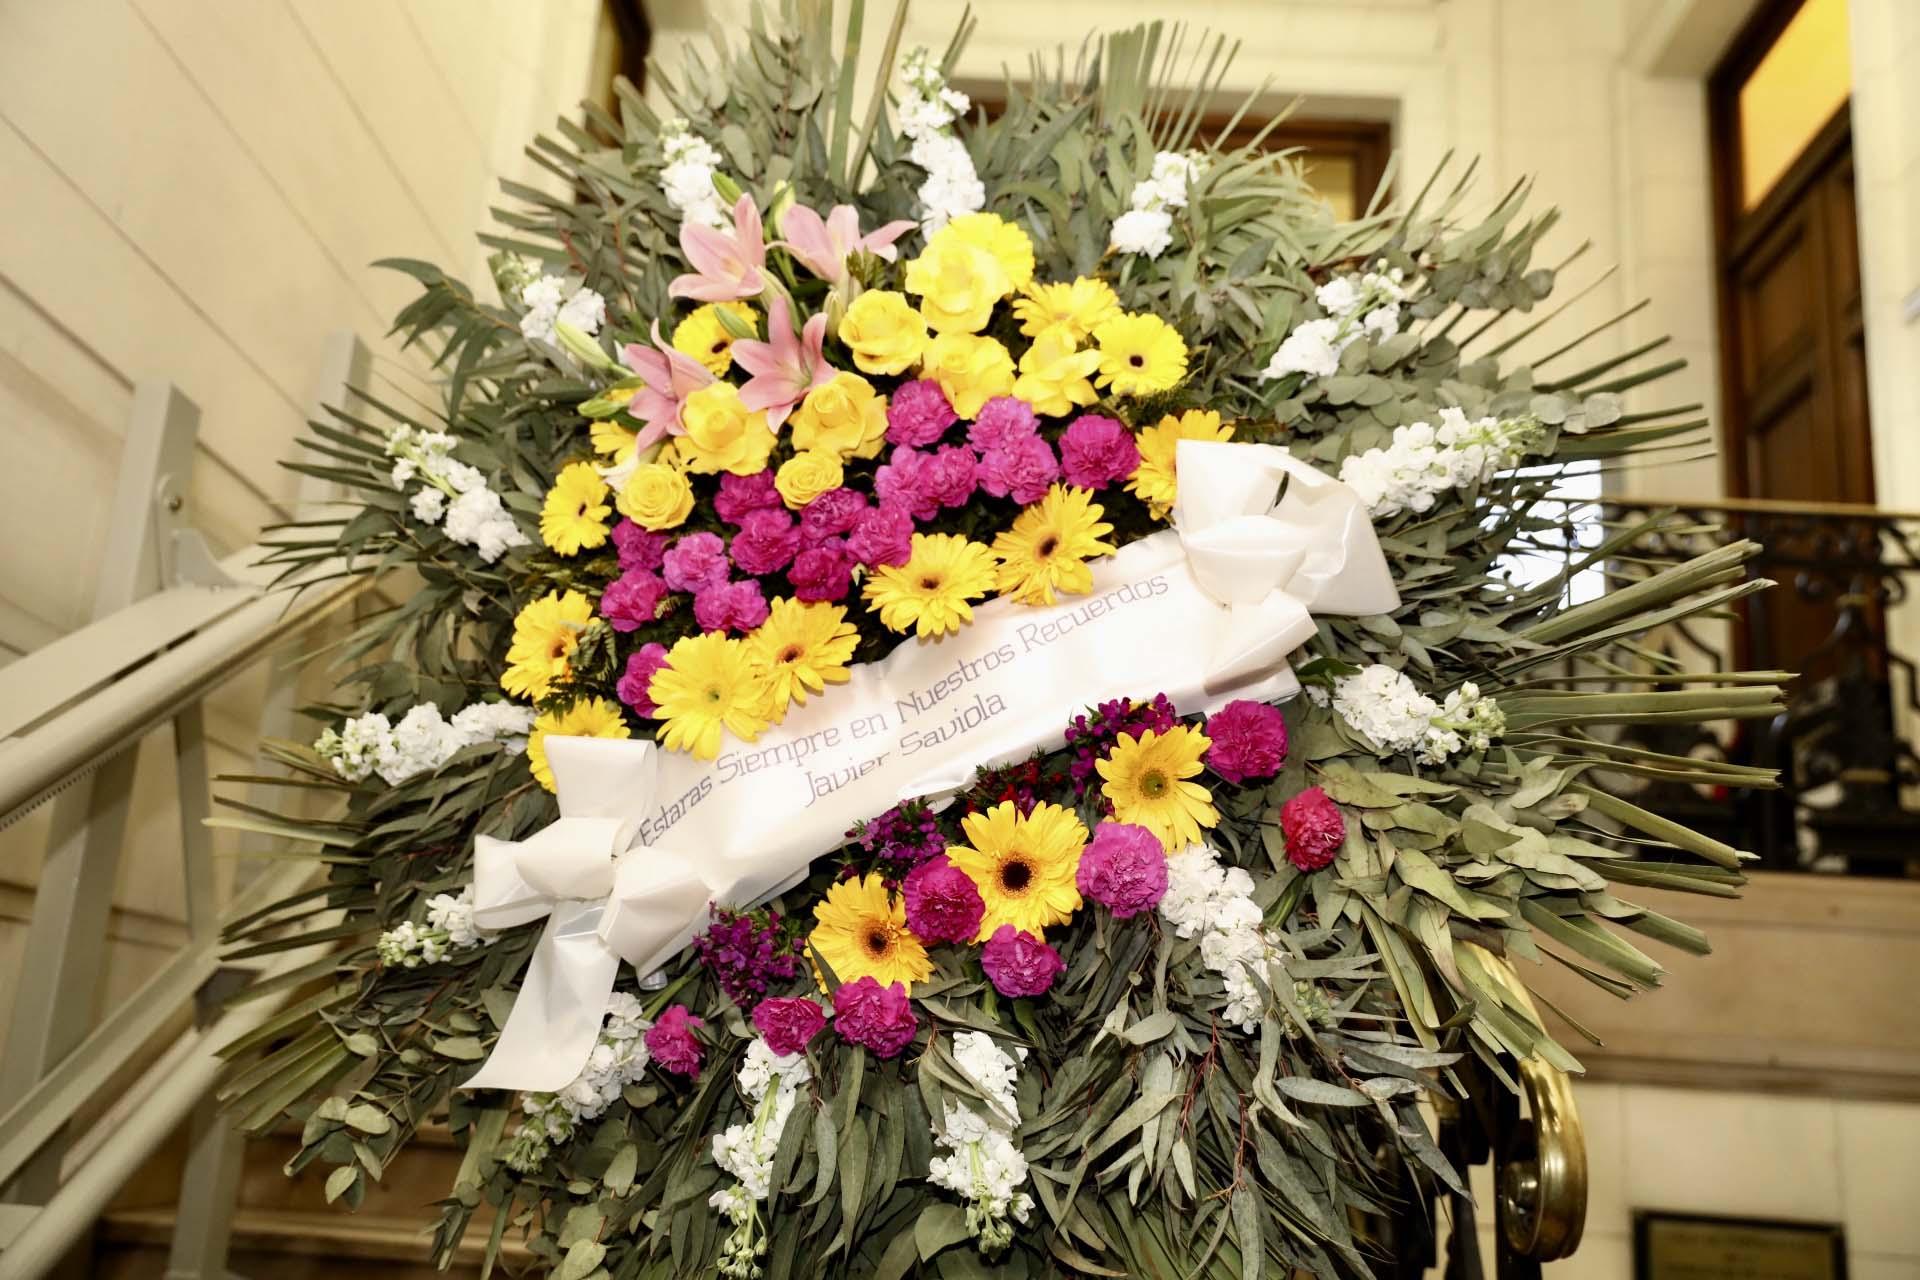 La ofrenda floral que envió la familia Saviola al velatorio: